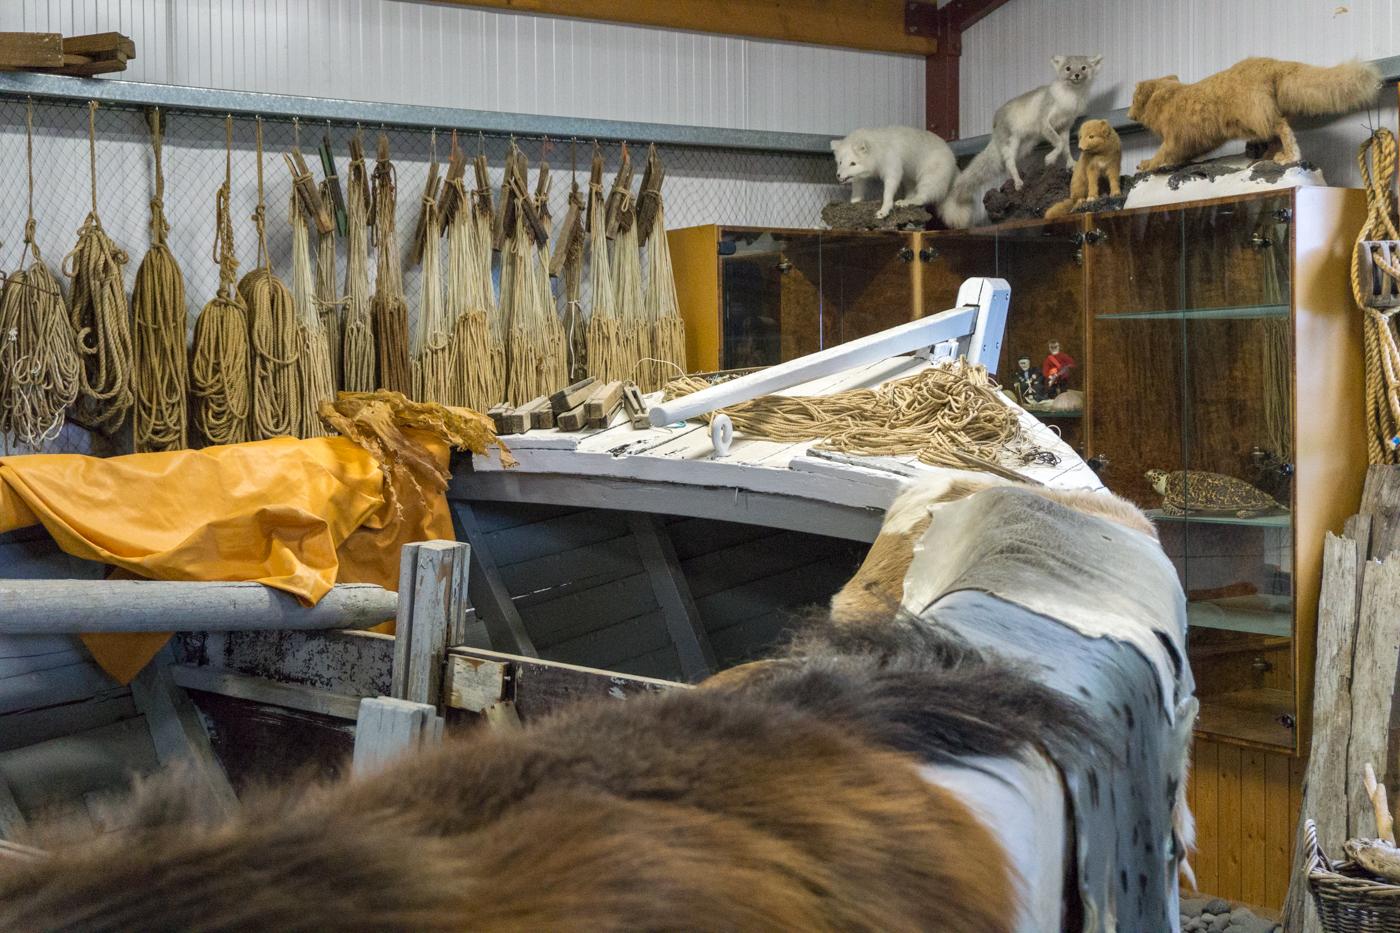 Musée du requin - Hakarl - Péninsule de Snaefellsnes, Islande